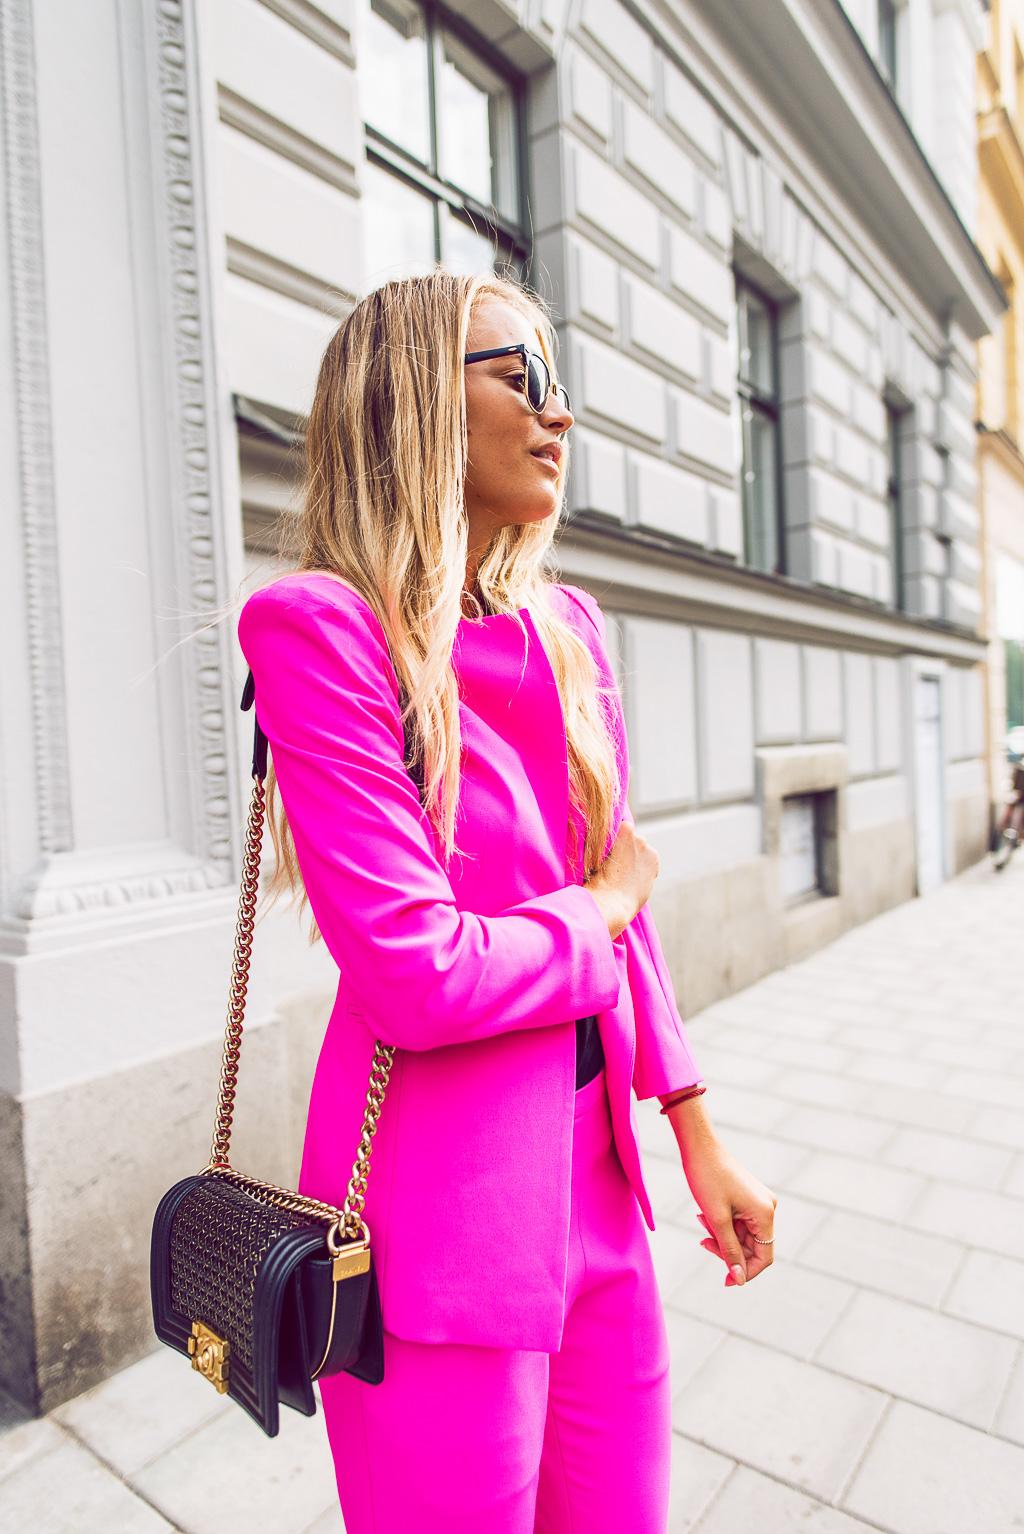 janni-deler-pink-suit-bymalinasDSC_2352-Redigera